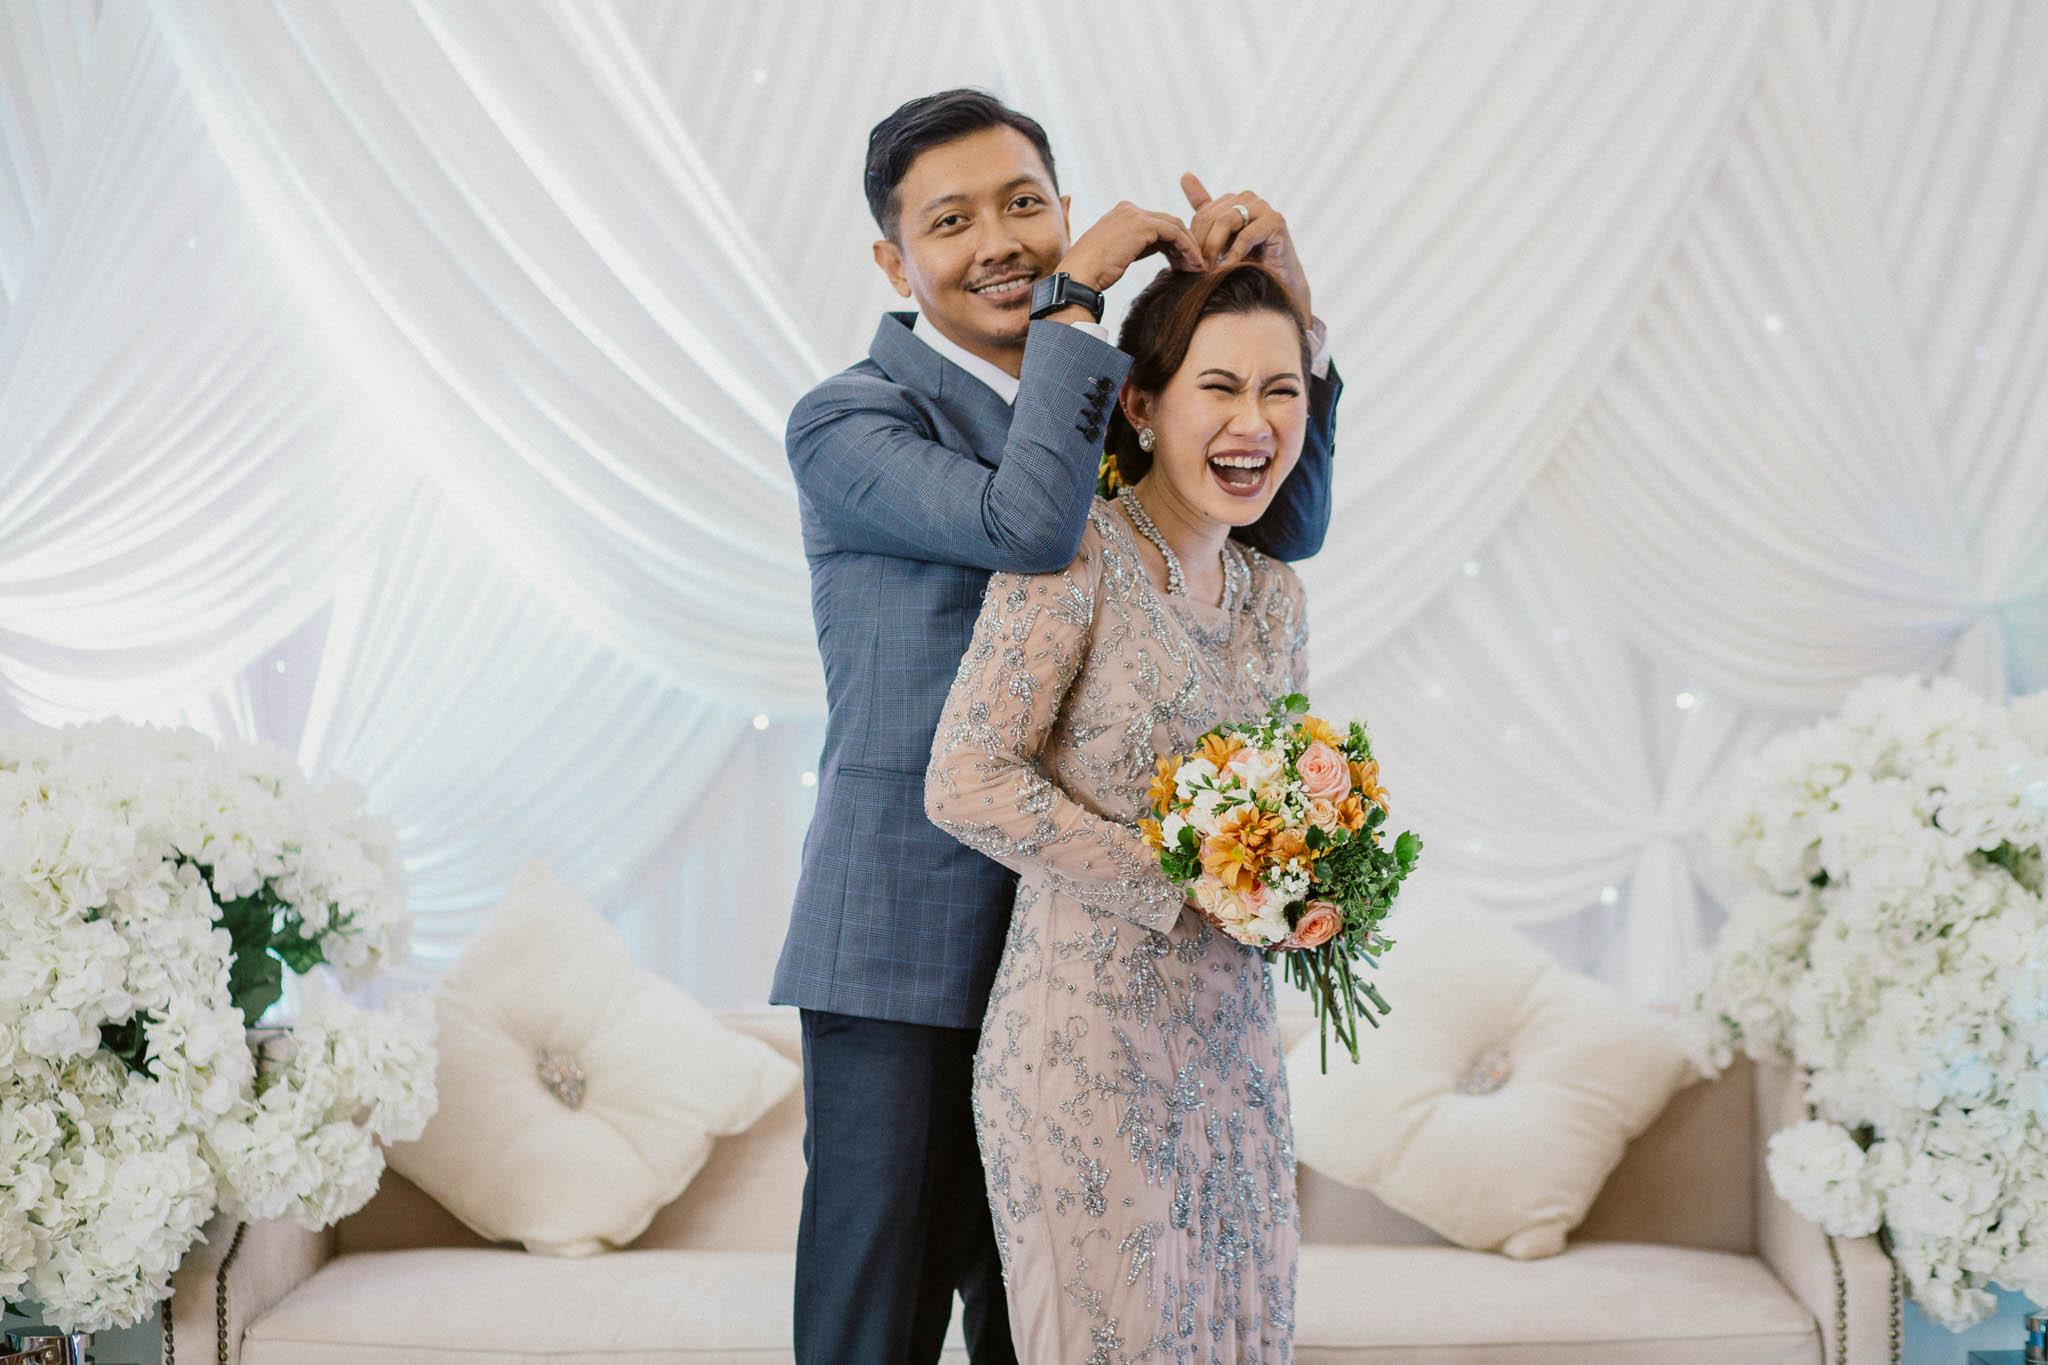 singapore-wedding-photographer-addafiq-nufail-064.jpg